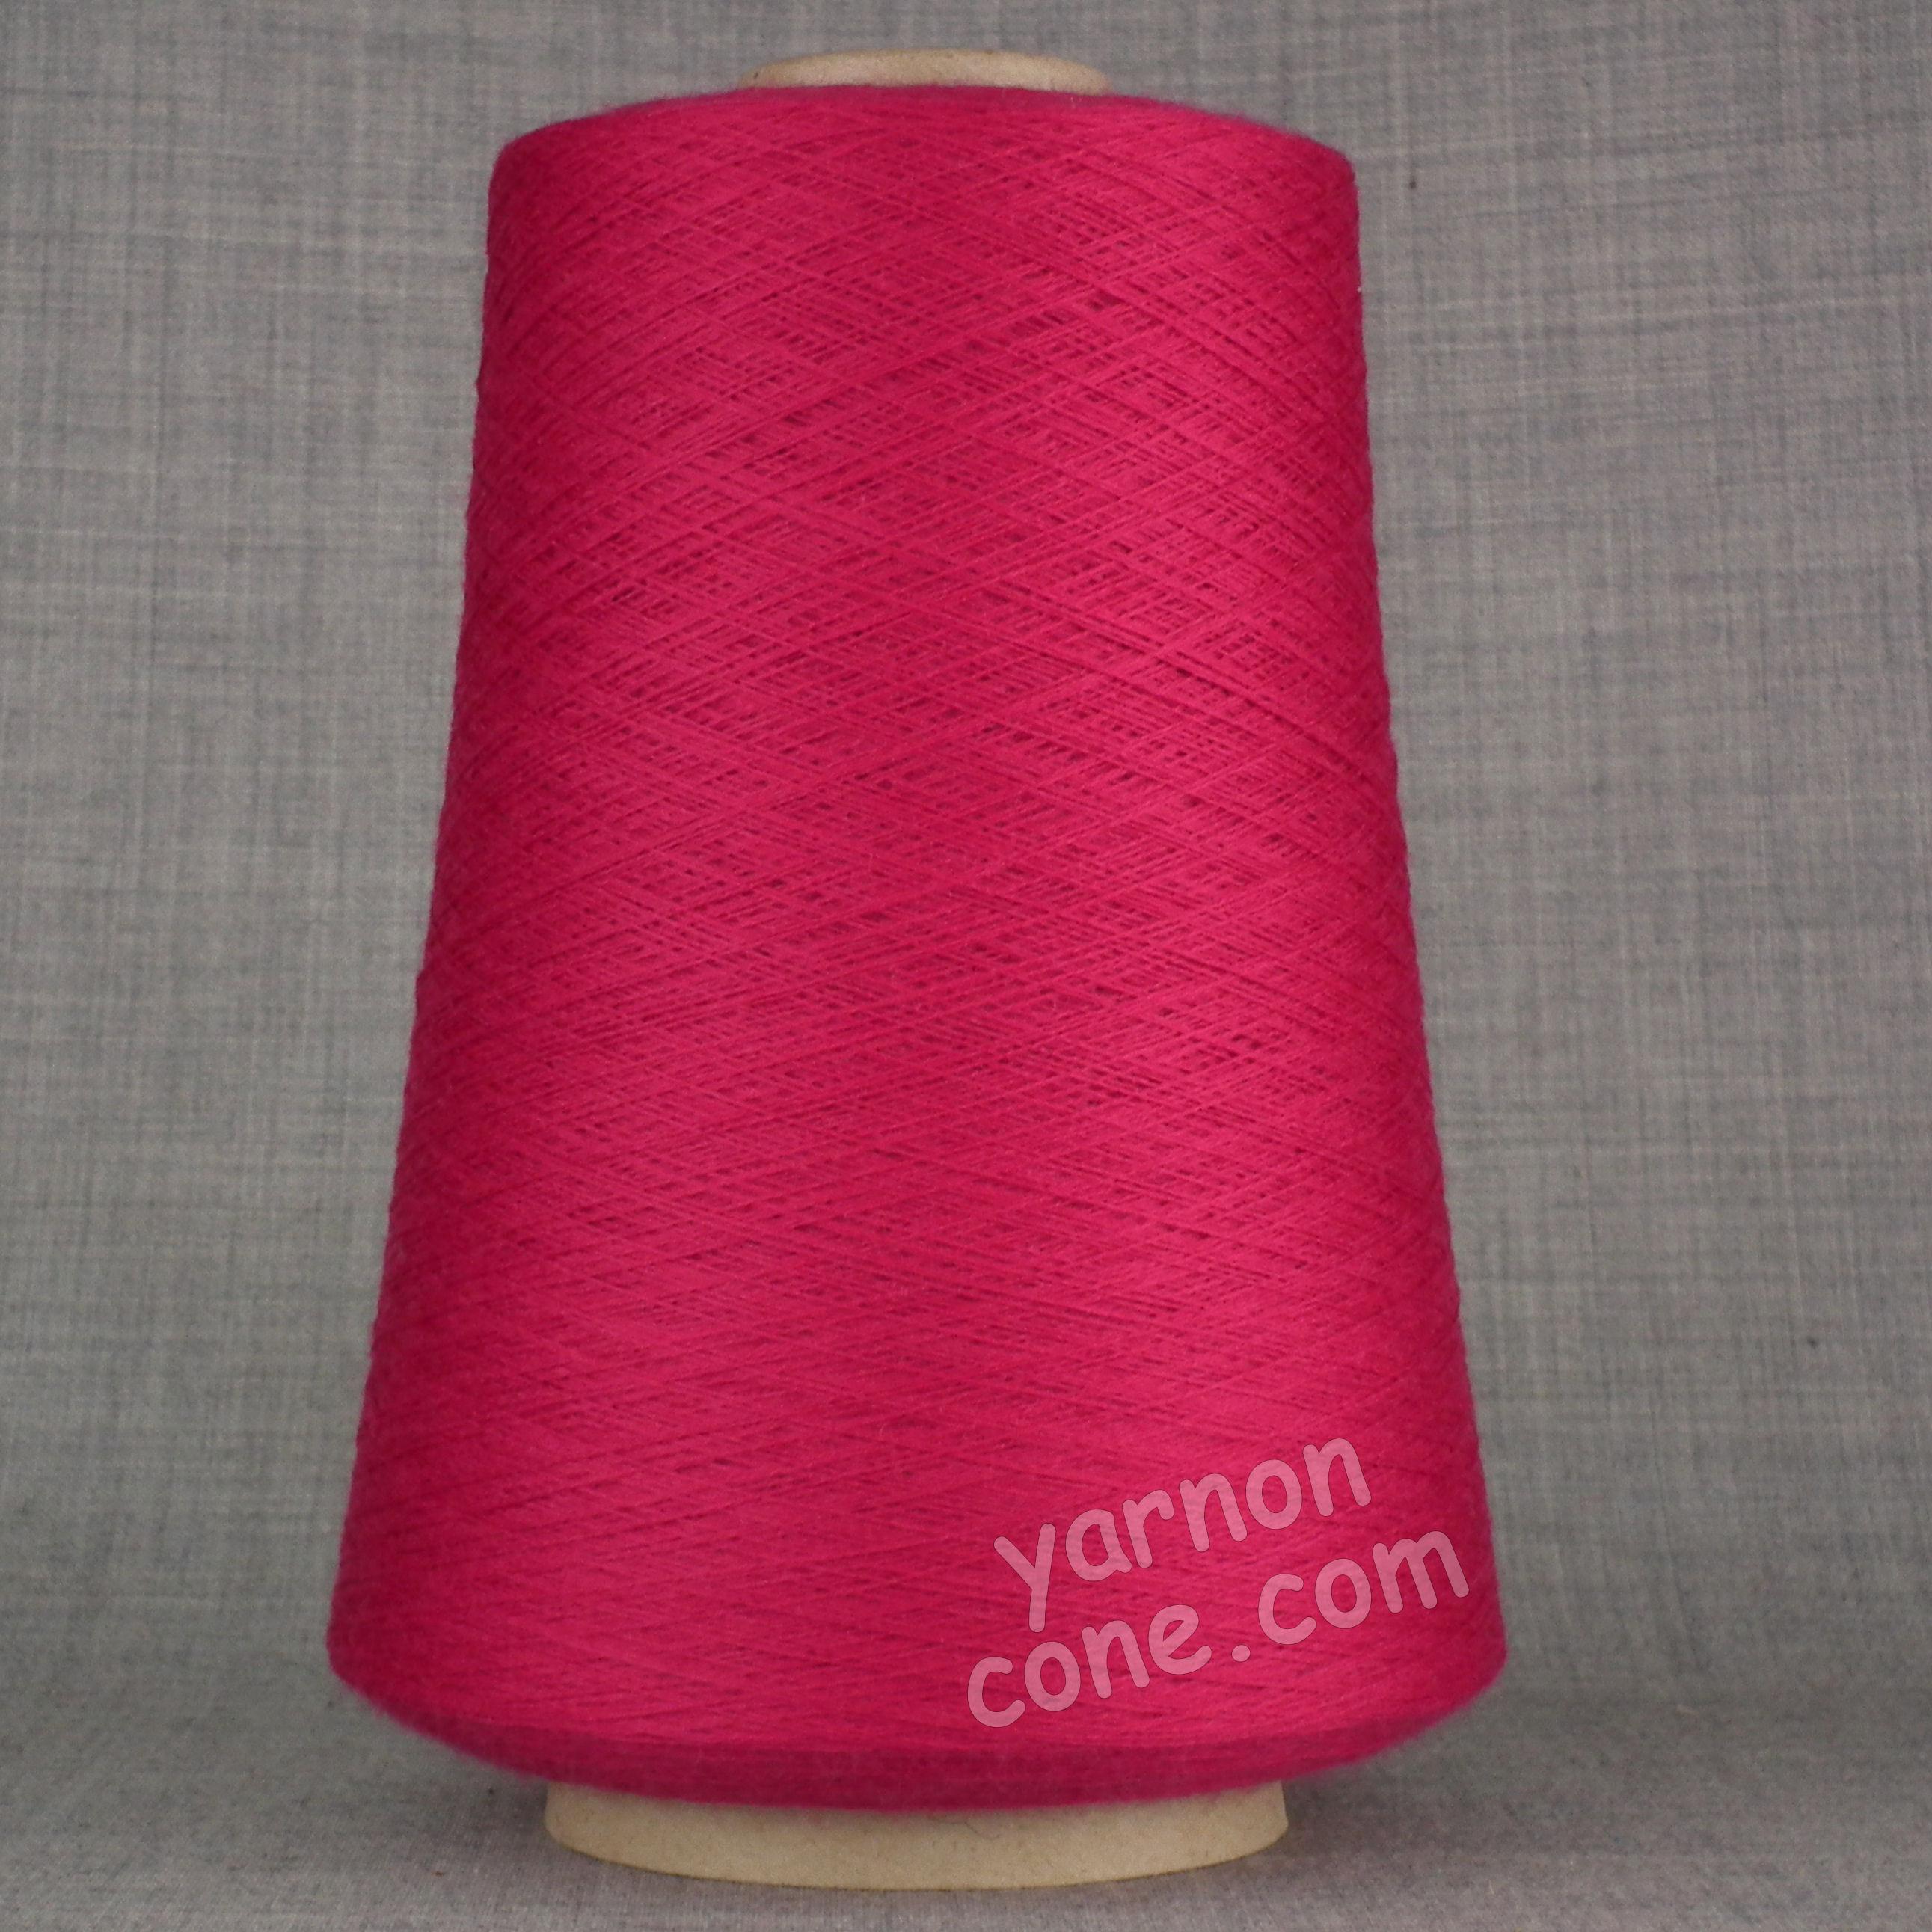 2/60NM extra fine merino wool knitting yarn on cone cobweb weight cerise pink